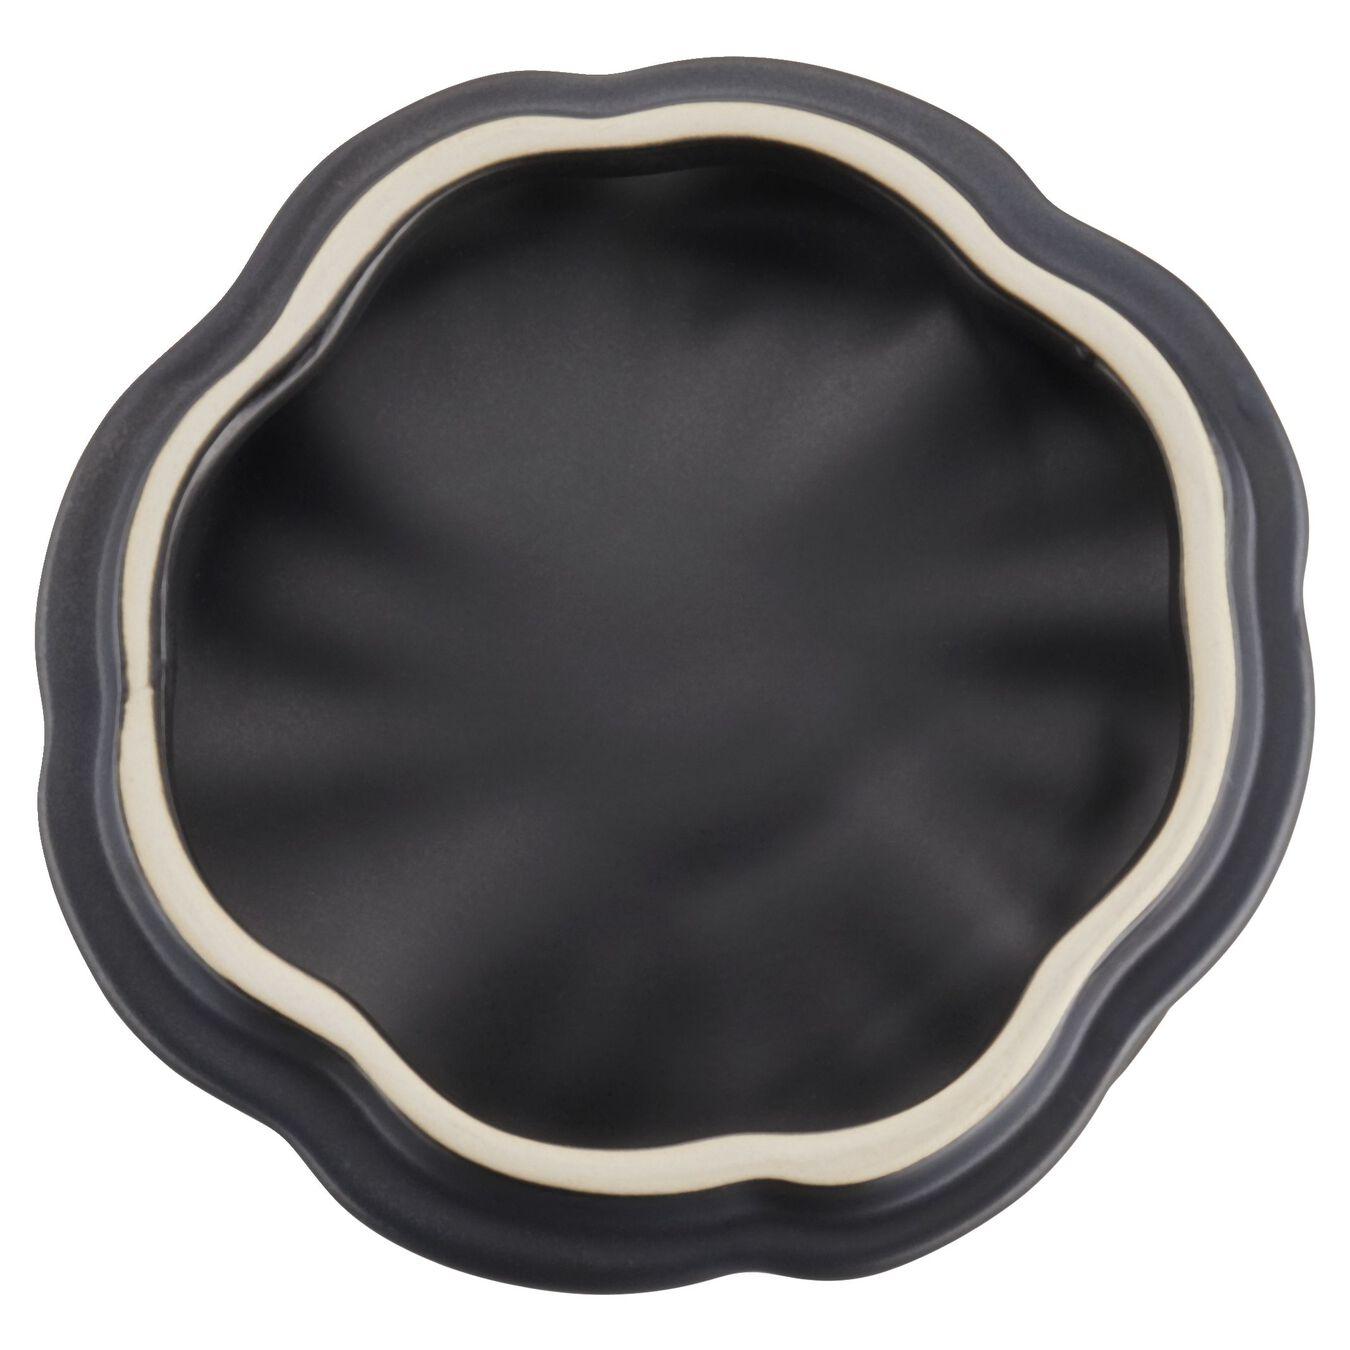 Keramik-Kürbis 0.5qt / 0.47 l - Black Matte 12 cm, Kürbis, Schwarz, Keramik,,large 10